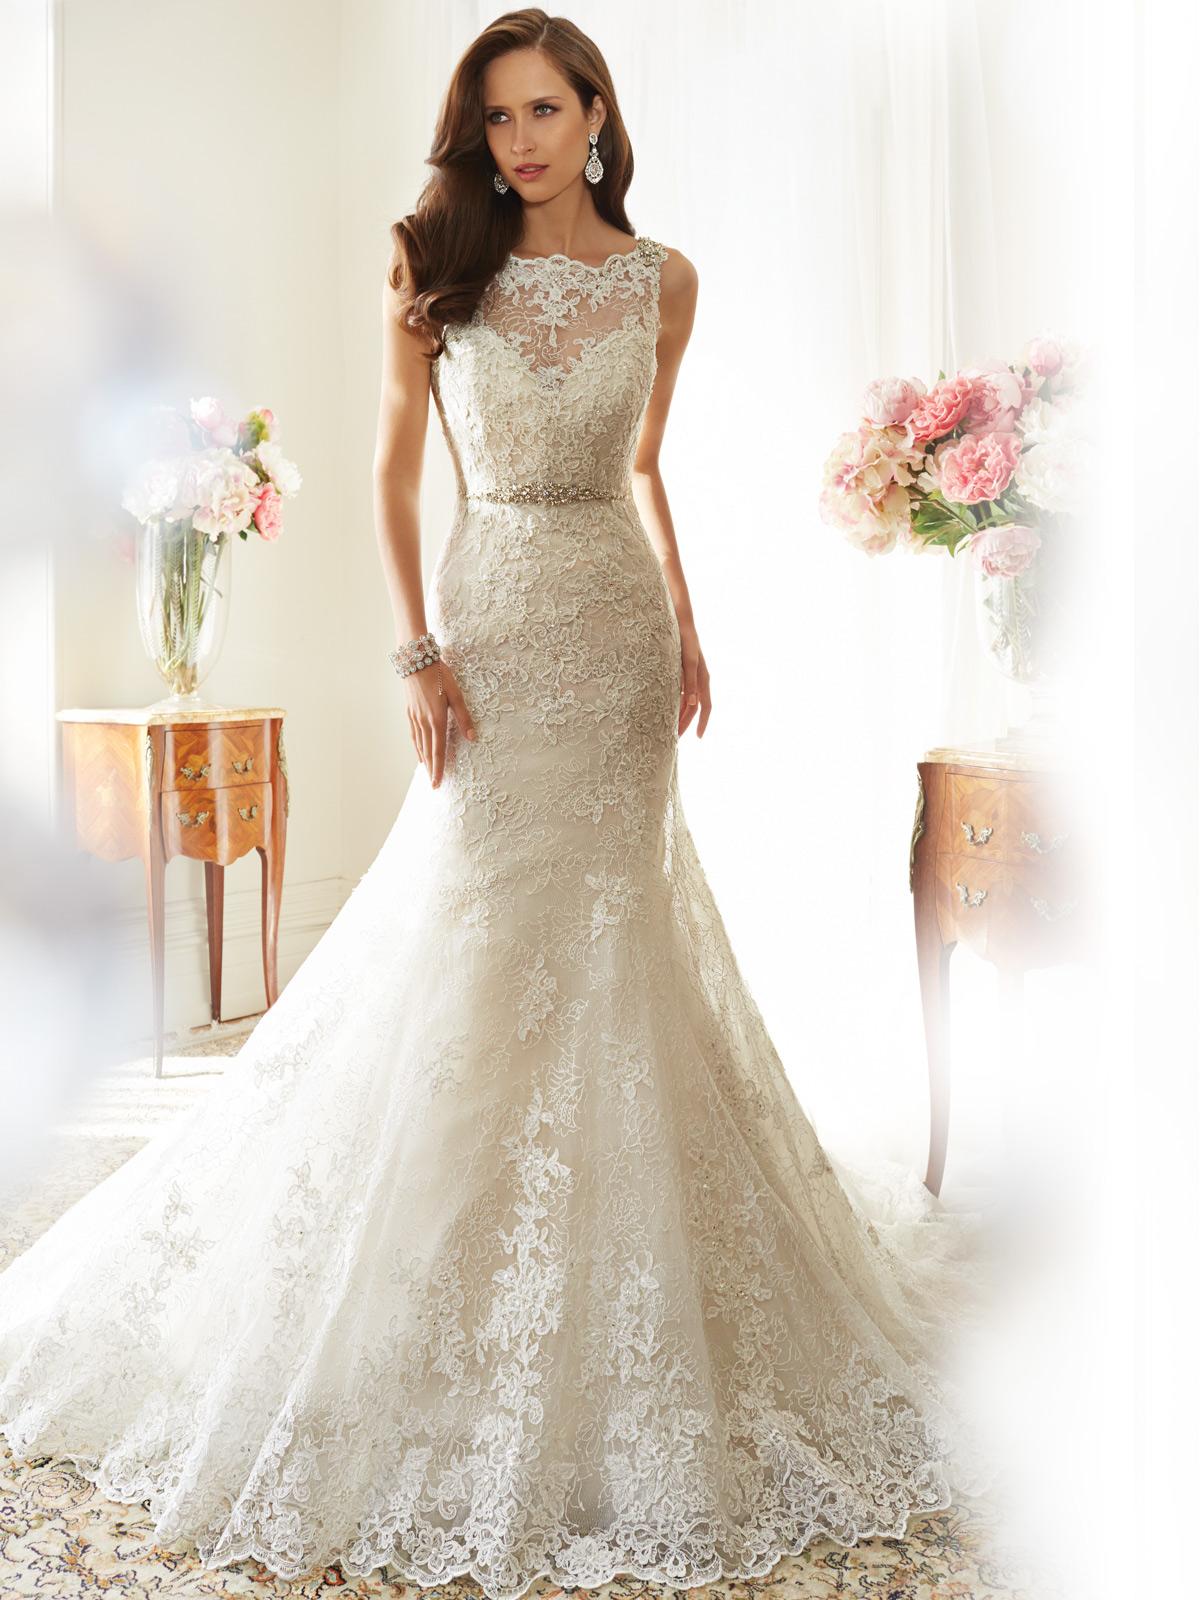 Dress Sophia Tolli Spring 2015 Collection Y11561 Teal Sophiatollibymoncheri Bridal